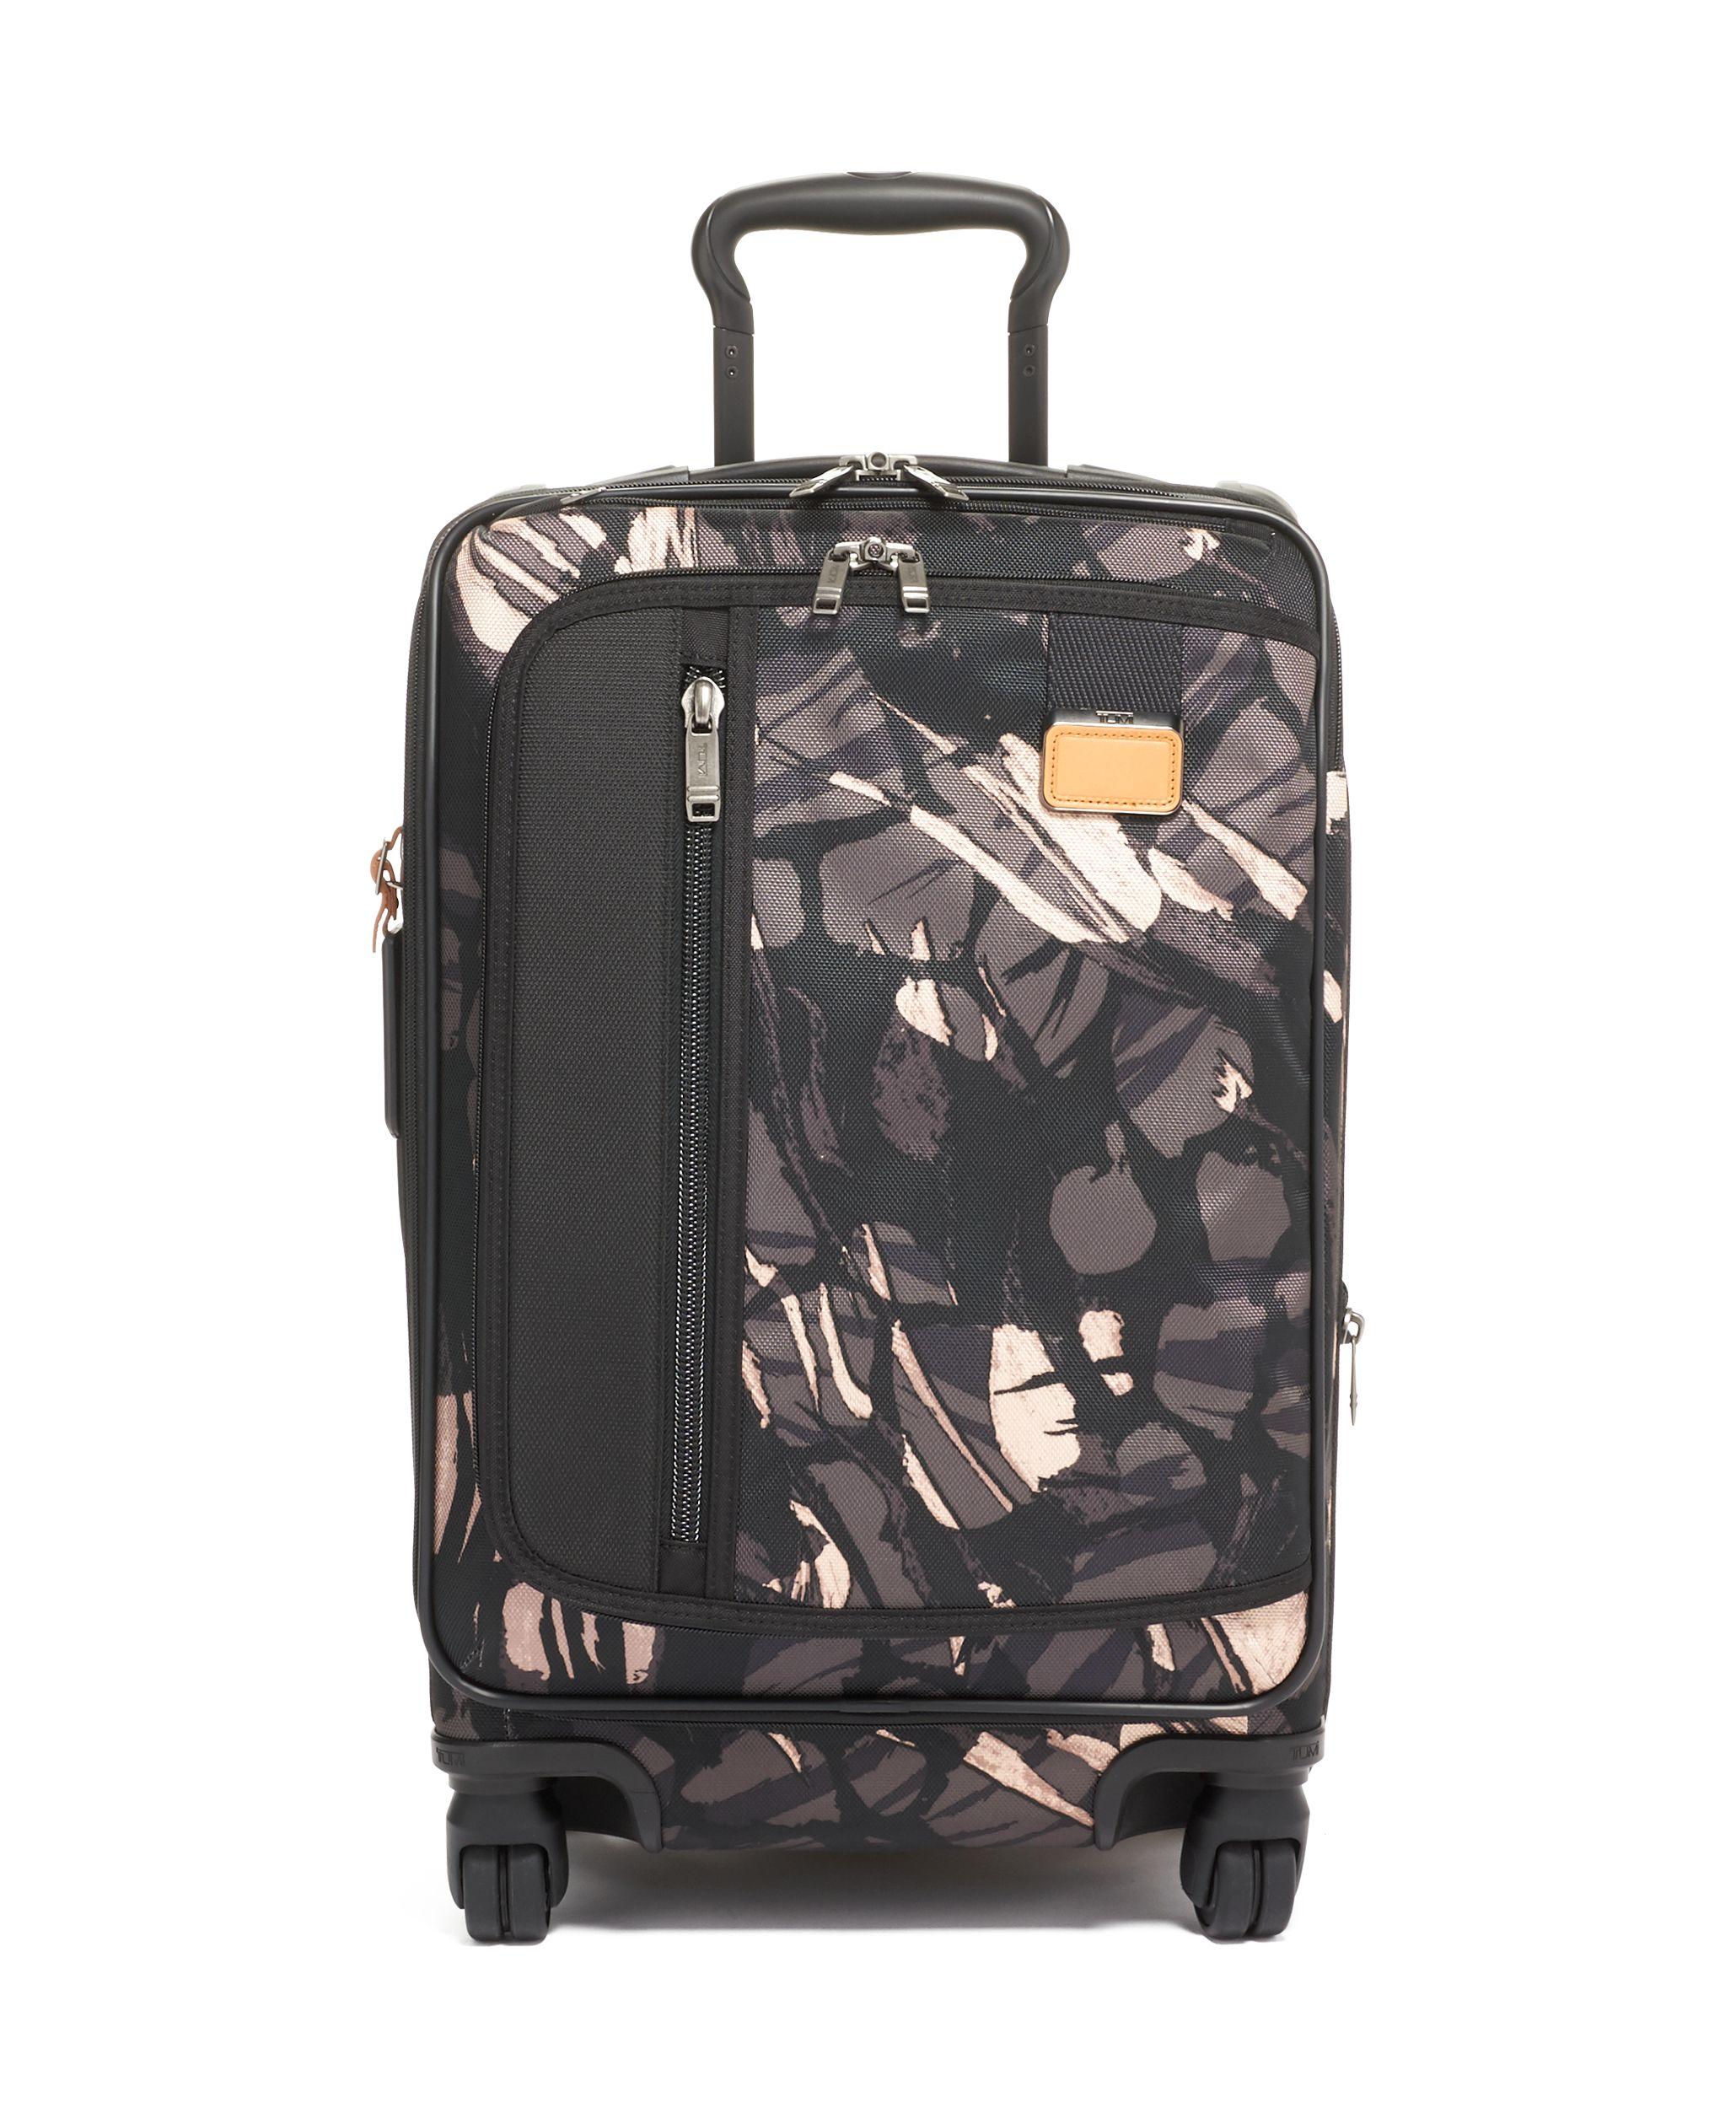 03fa42370d3b International Expandable Carry-On